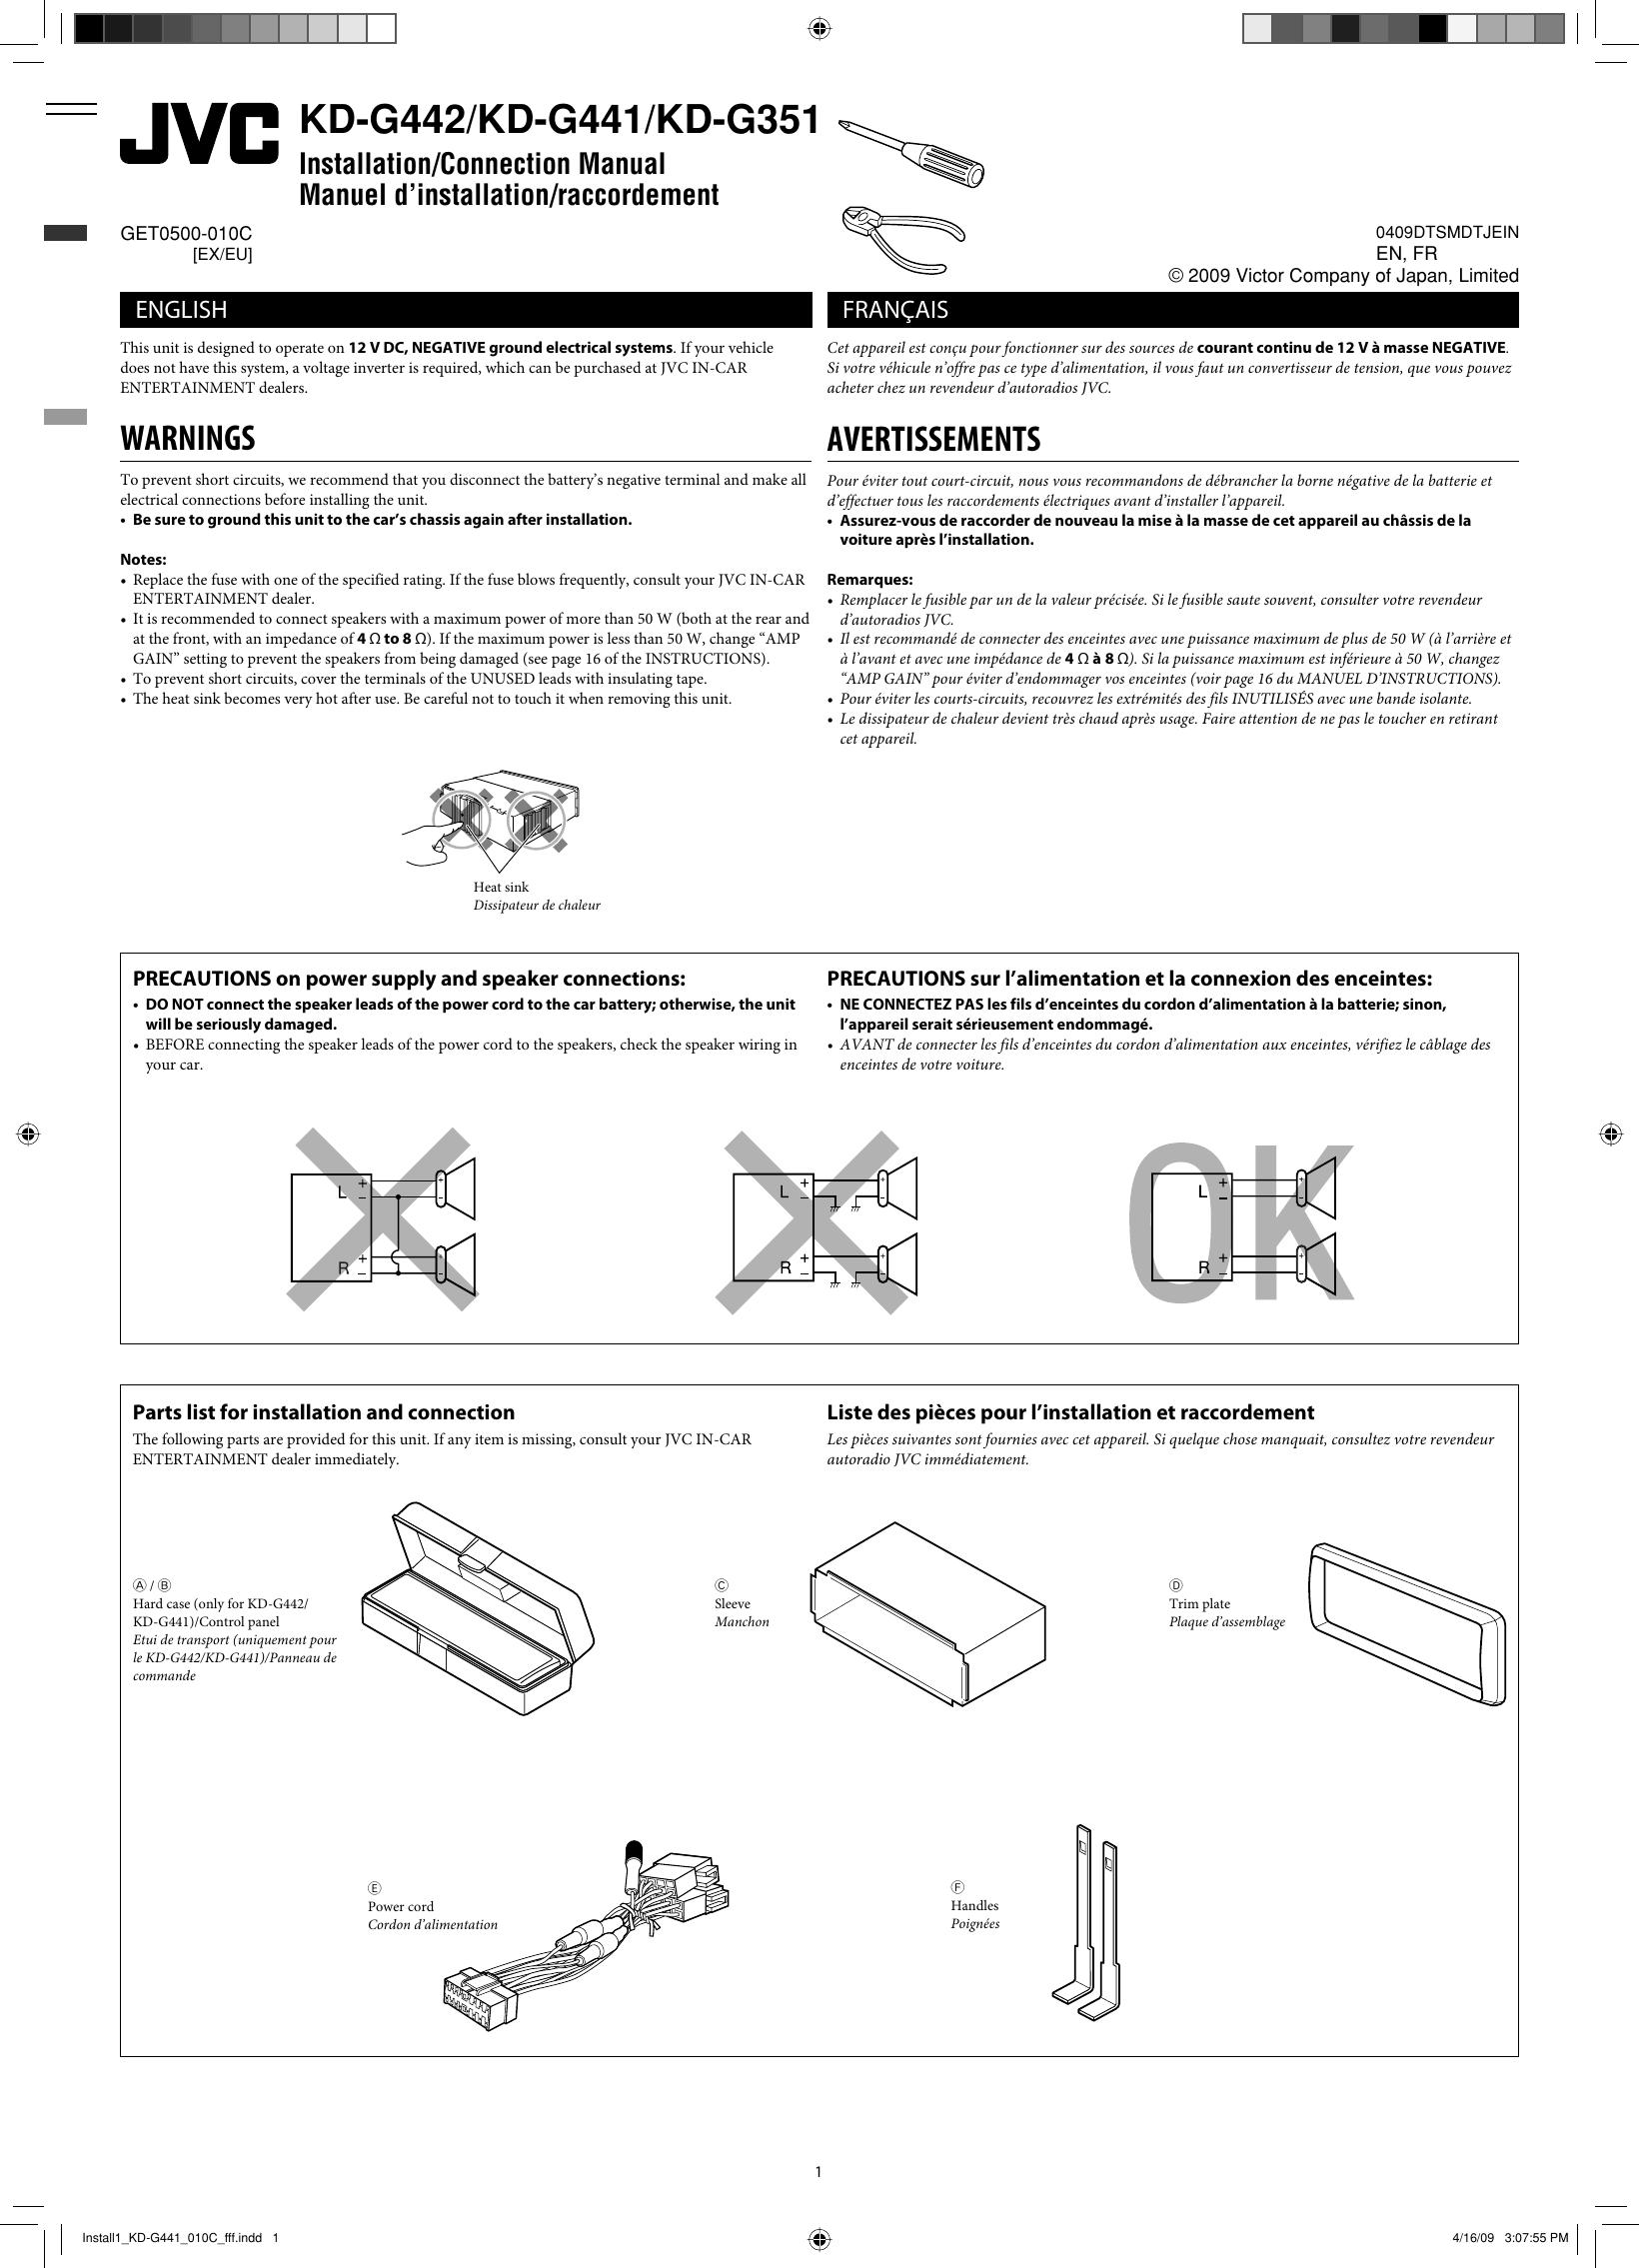 Case Diagram Ex Le Wiring Software To Draw Data Flow Jvc Kd R200 Contemporary Motif Electrical Kdg441eu